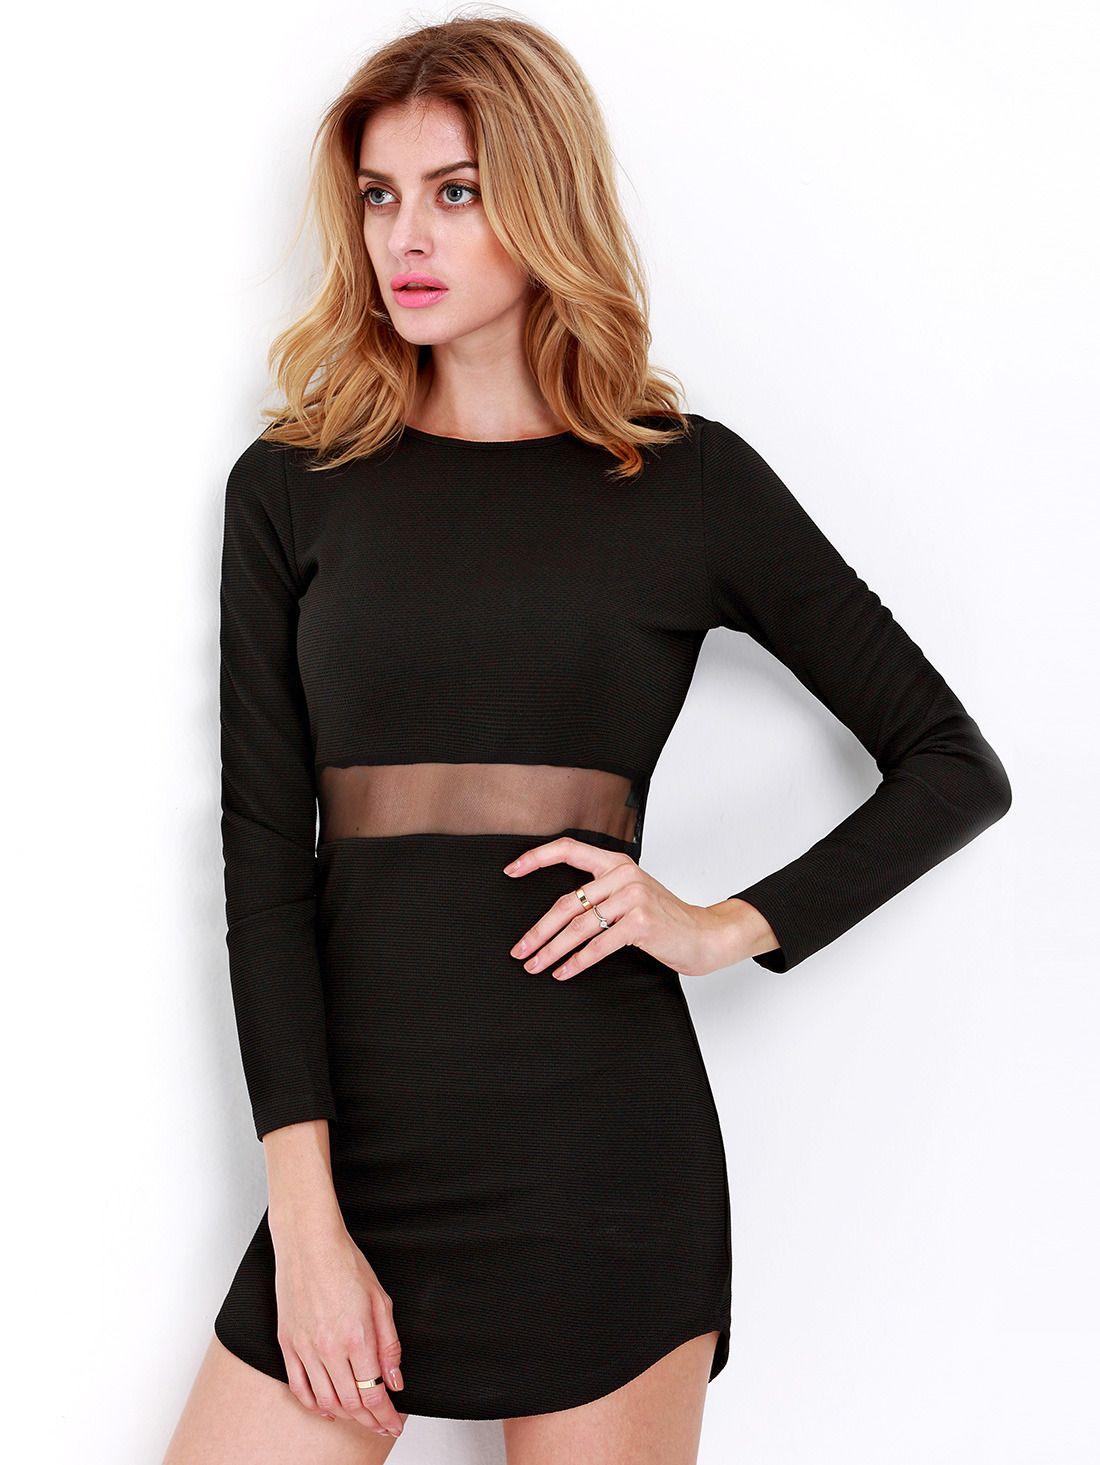 Black Long Sleeve Slim Bodycon Dress | Spotlights | Pinterest